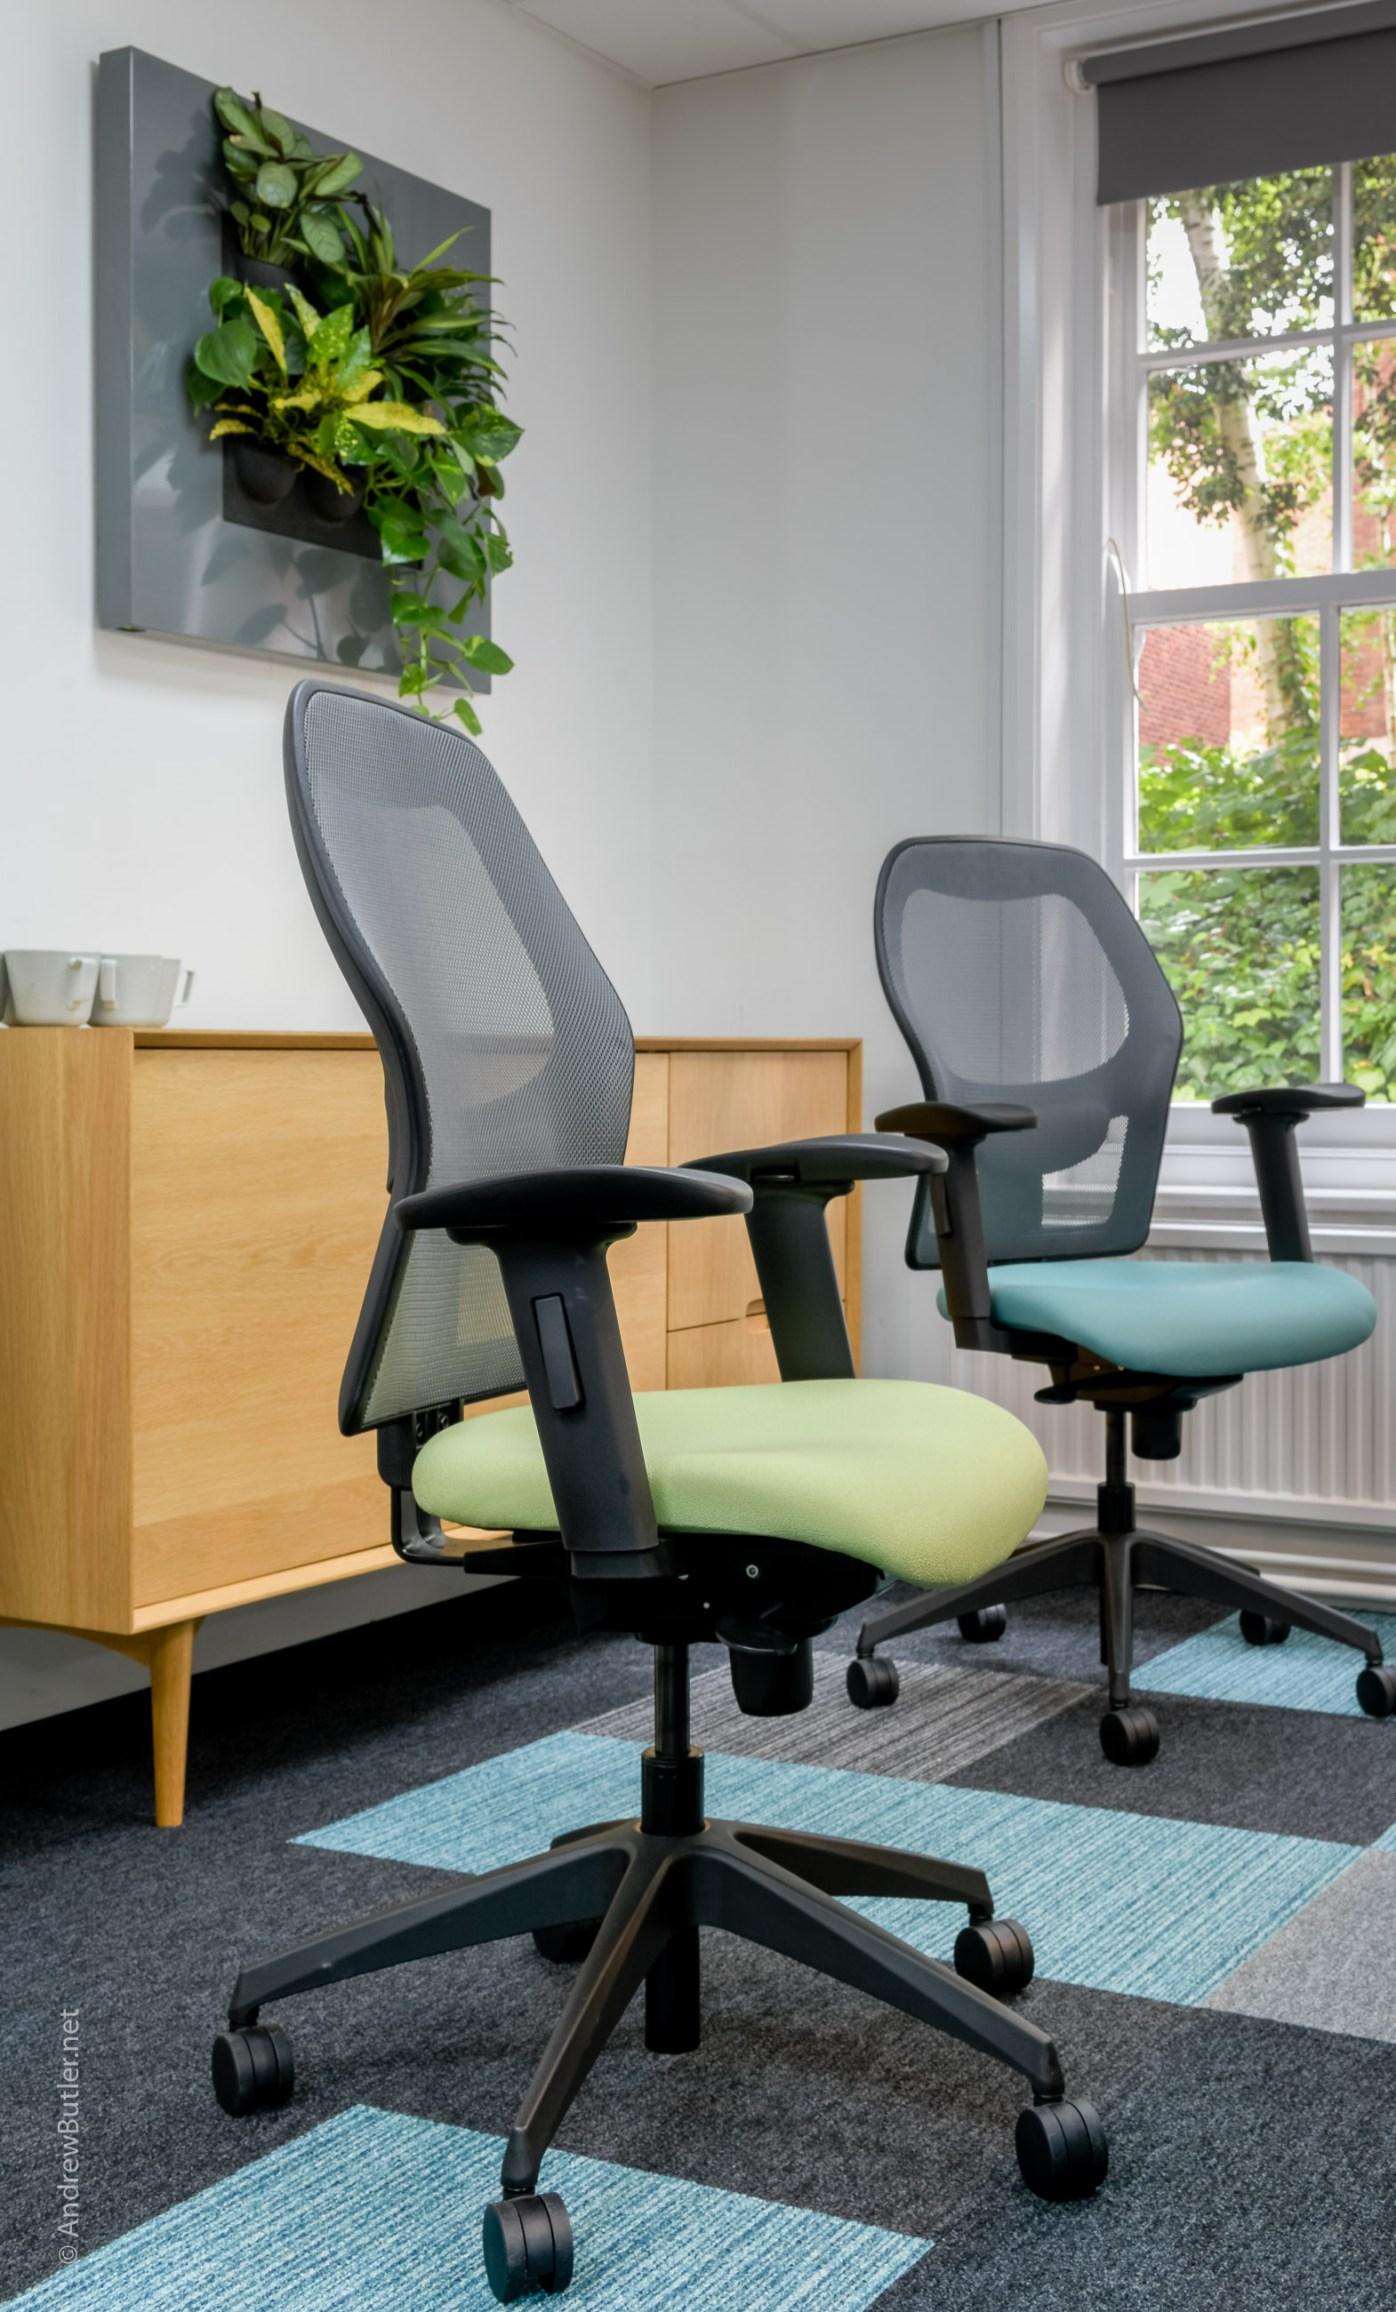 Furniture Product Photographer Exeter Devon